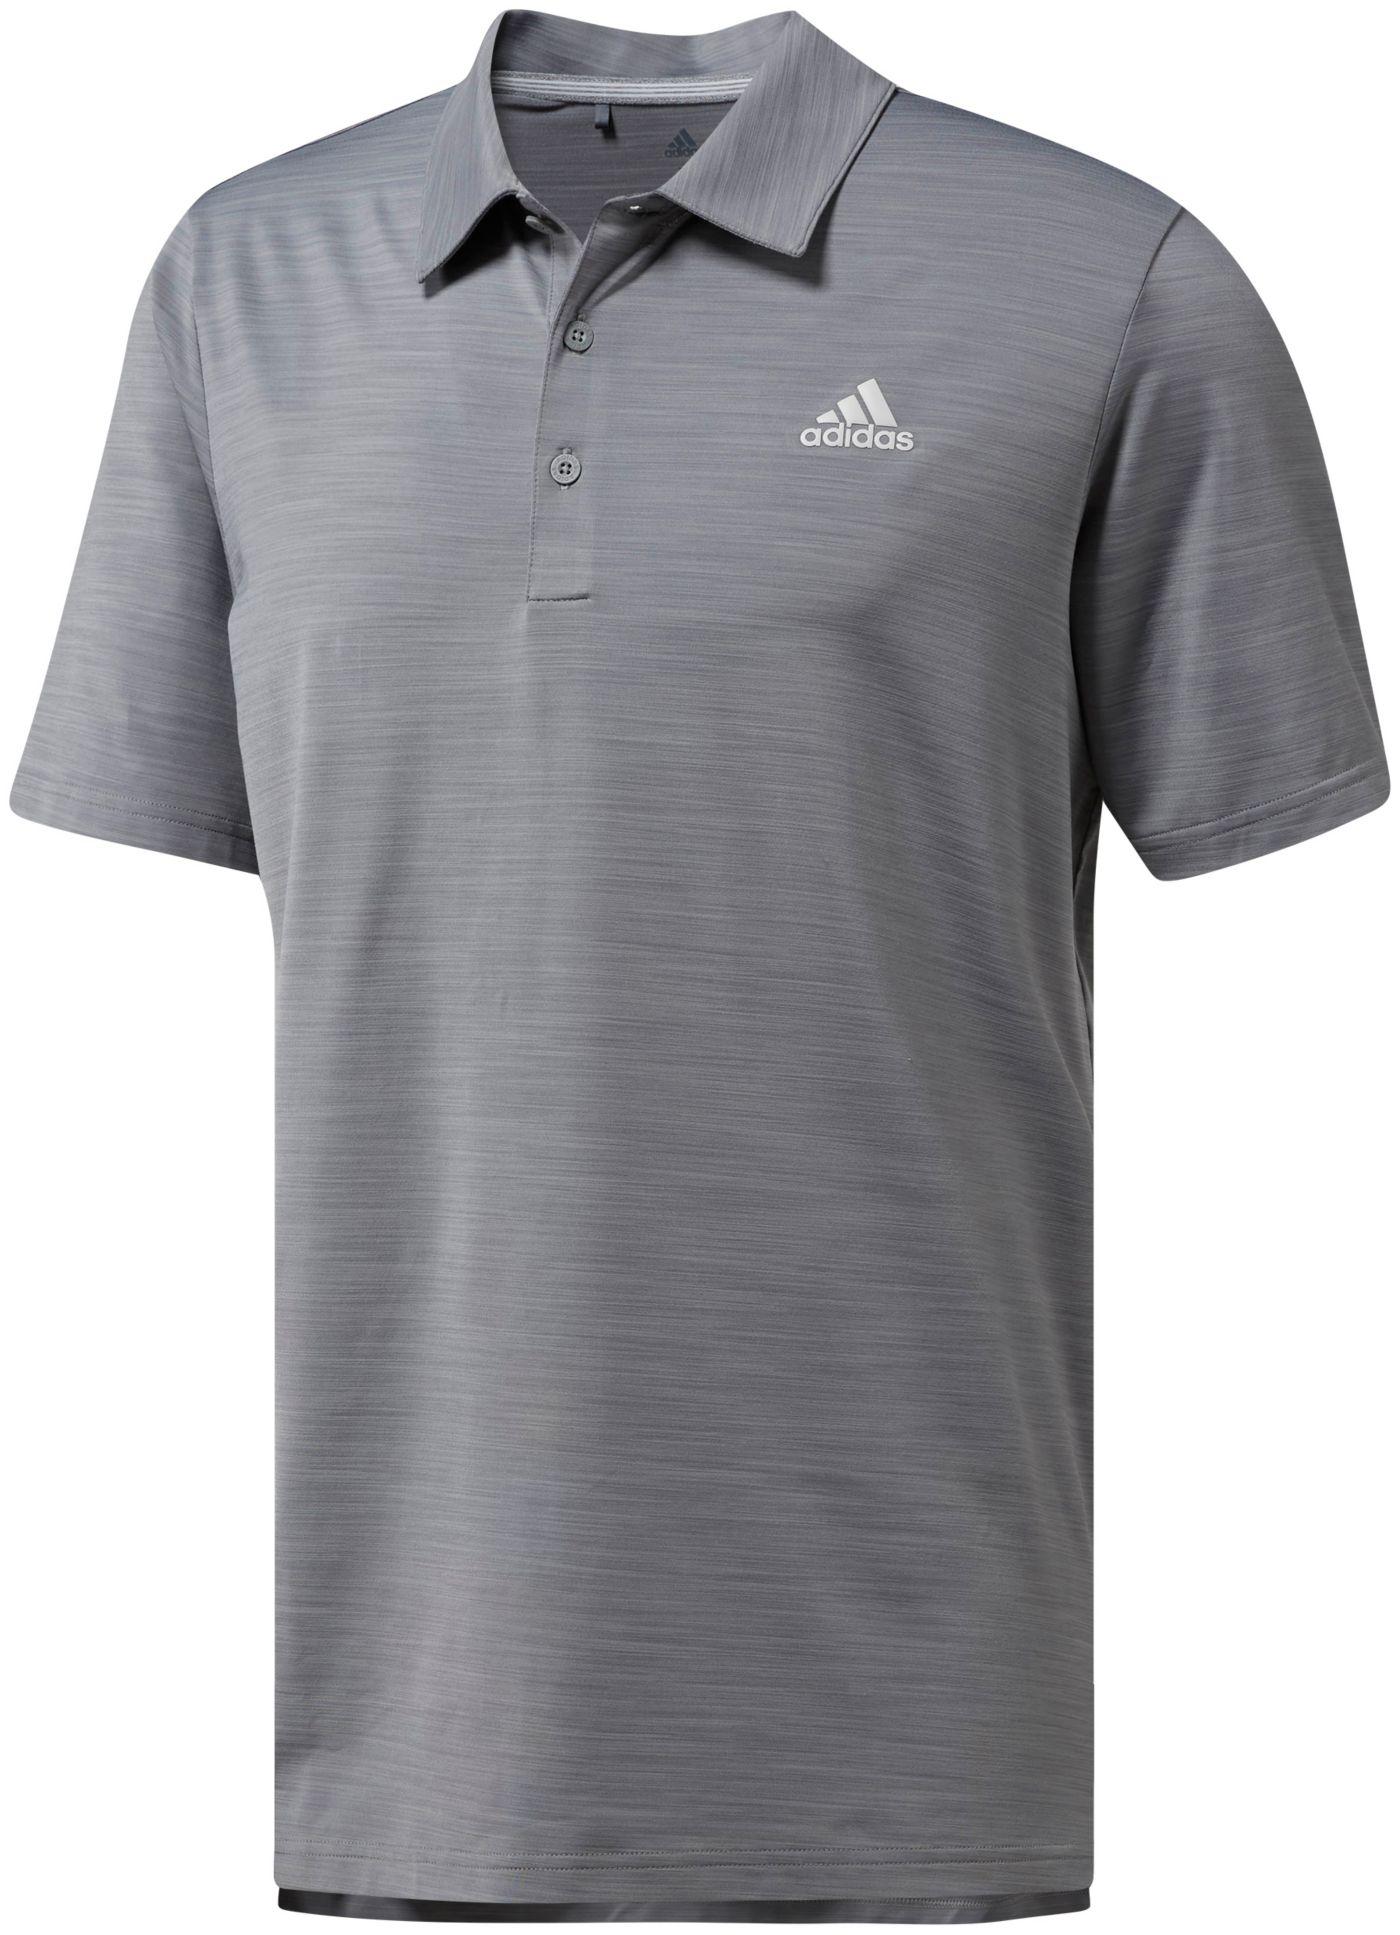 adidas Men's Ultimate365 Heather Golf Polo